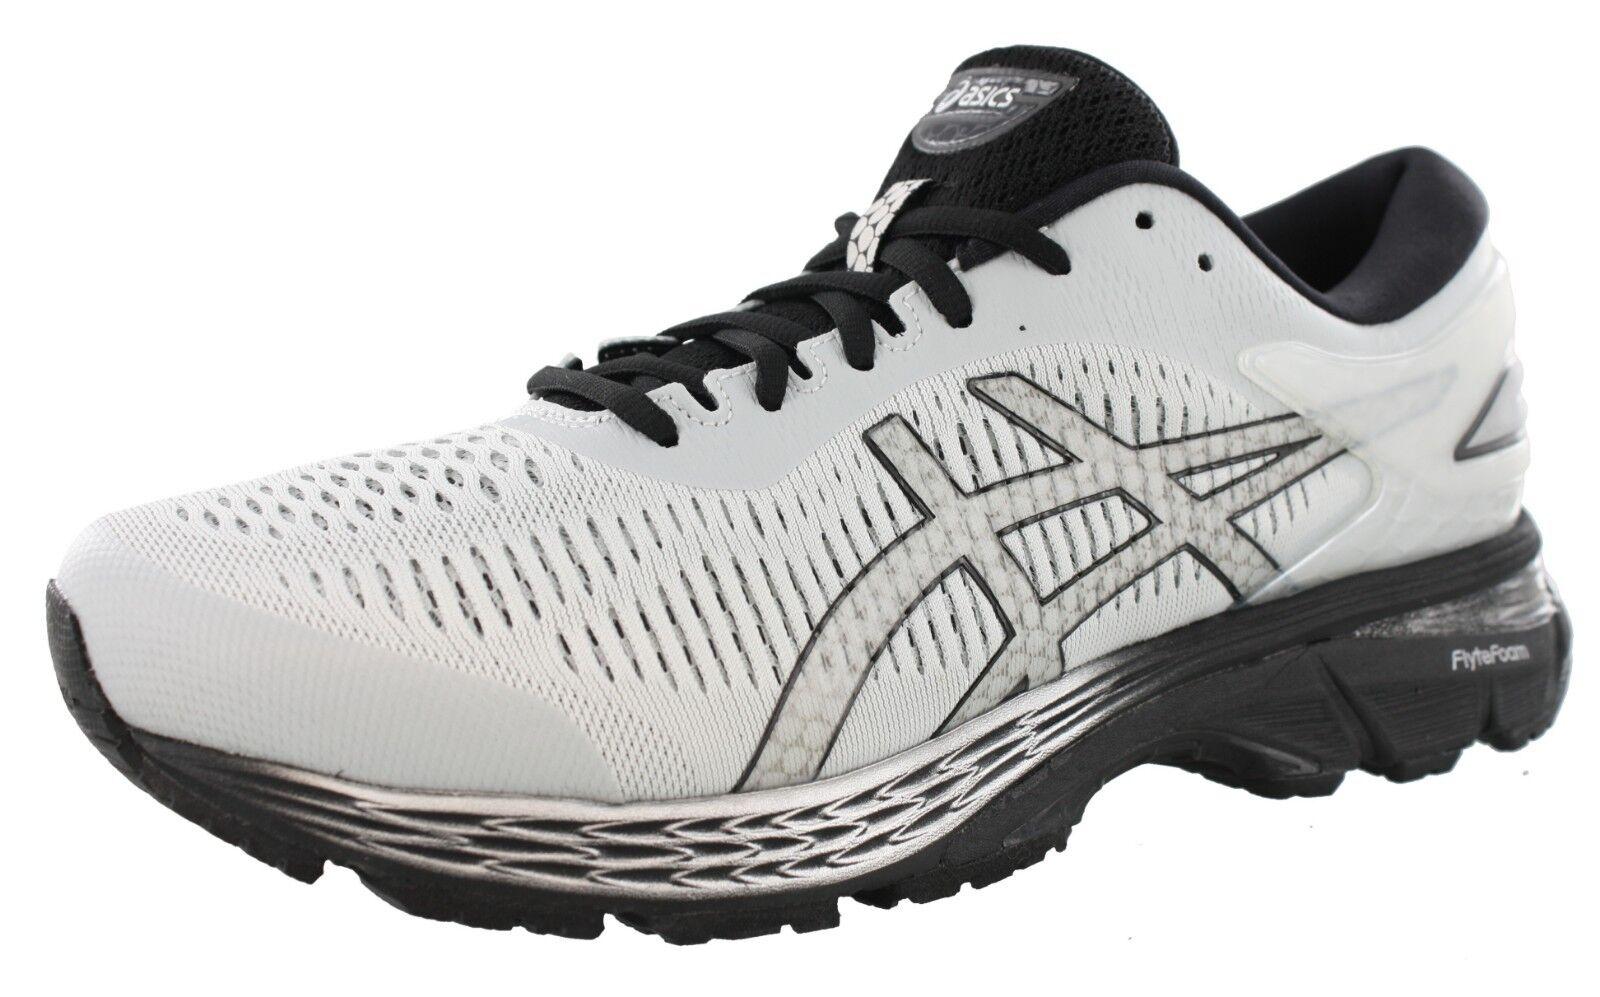 Asics Gel Kayano 23 (4E) Mens Running Shoe